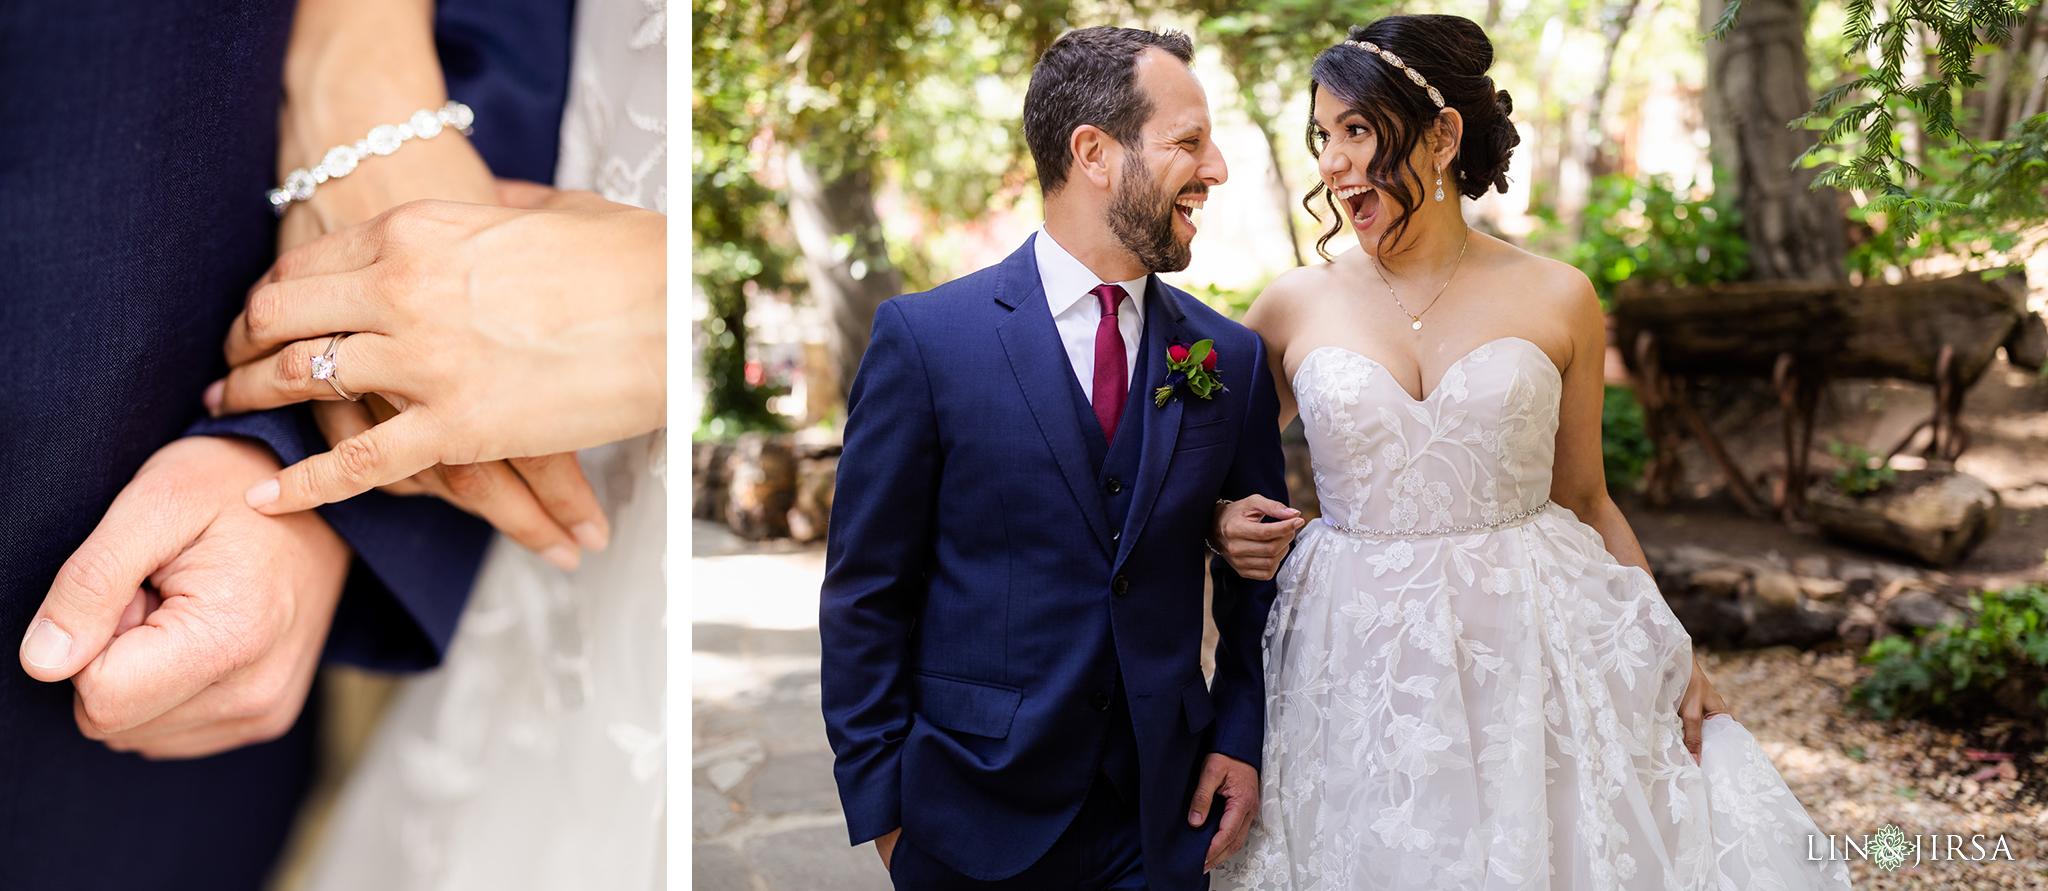 13 Calamigos Rancho Malibu Wedding Photography